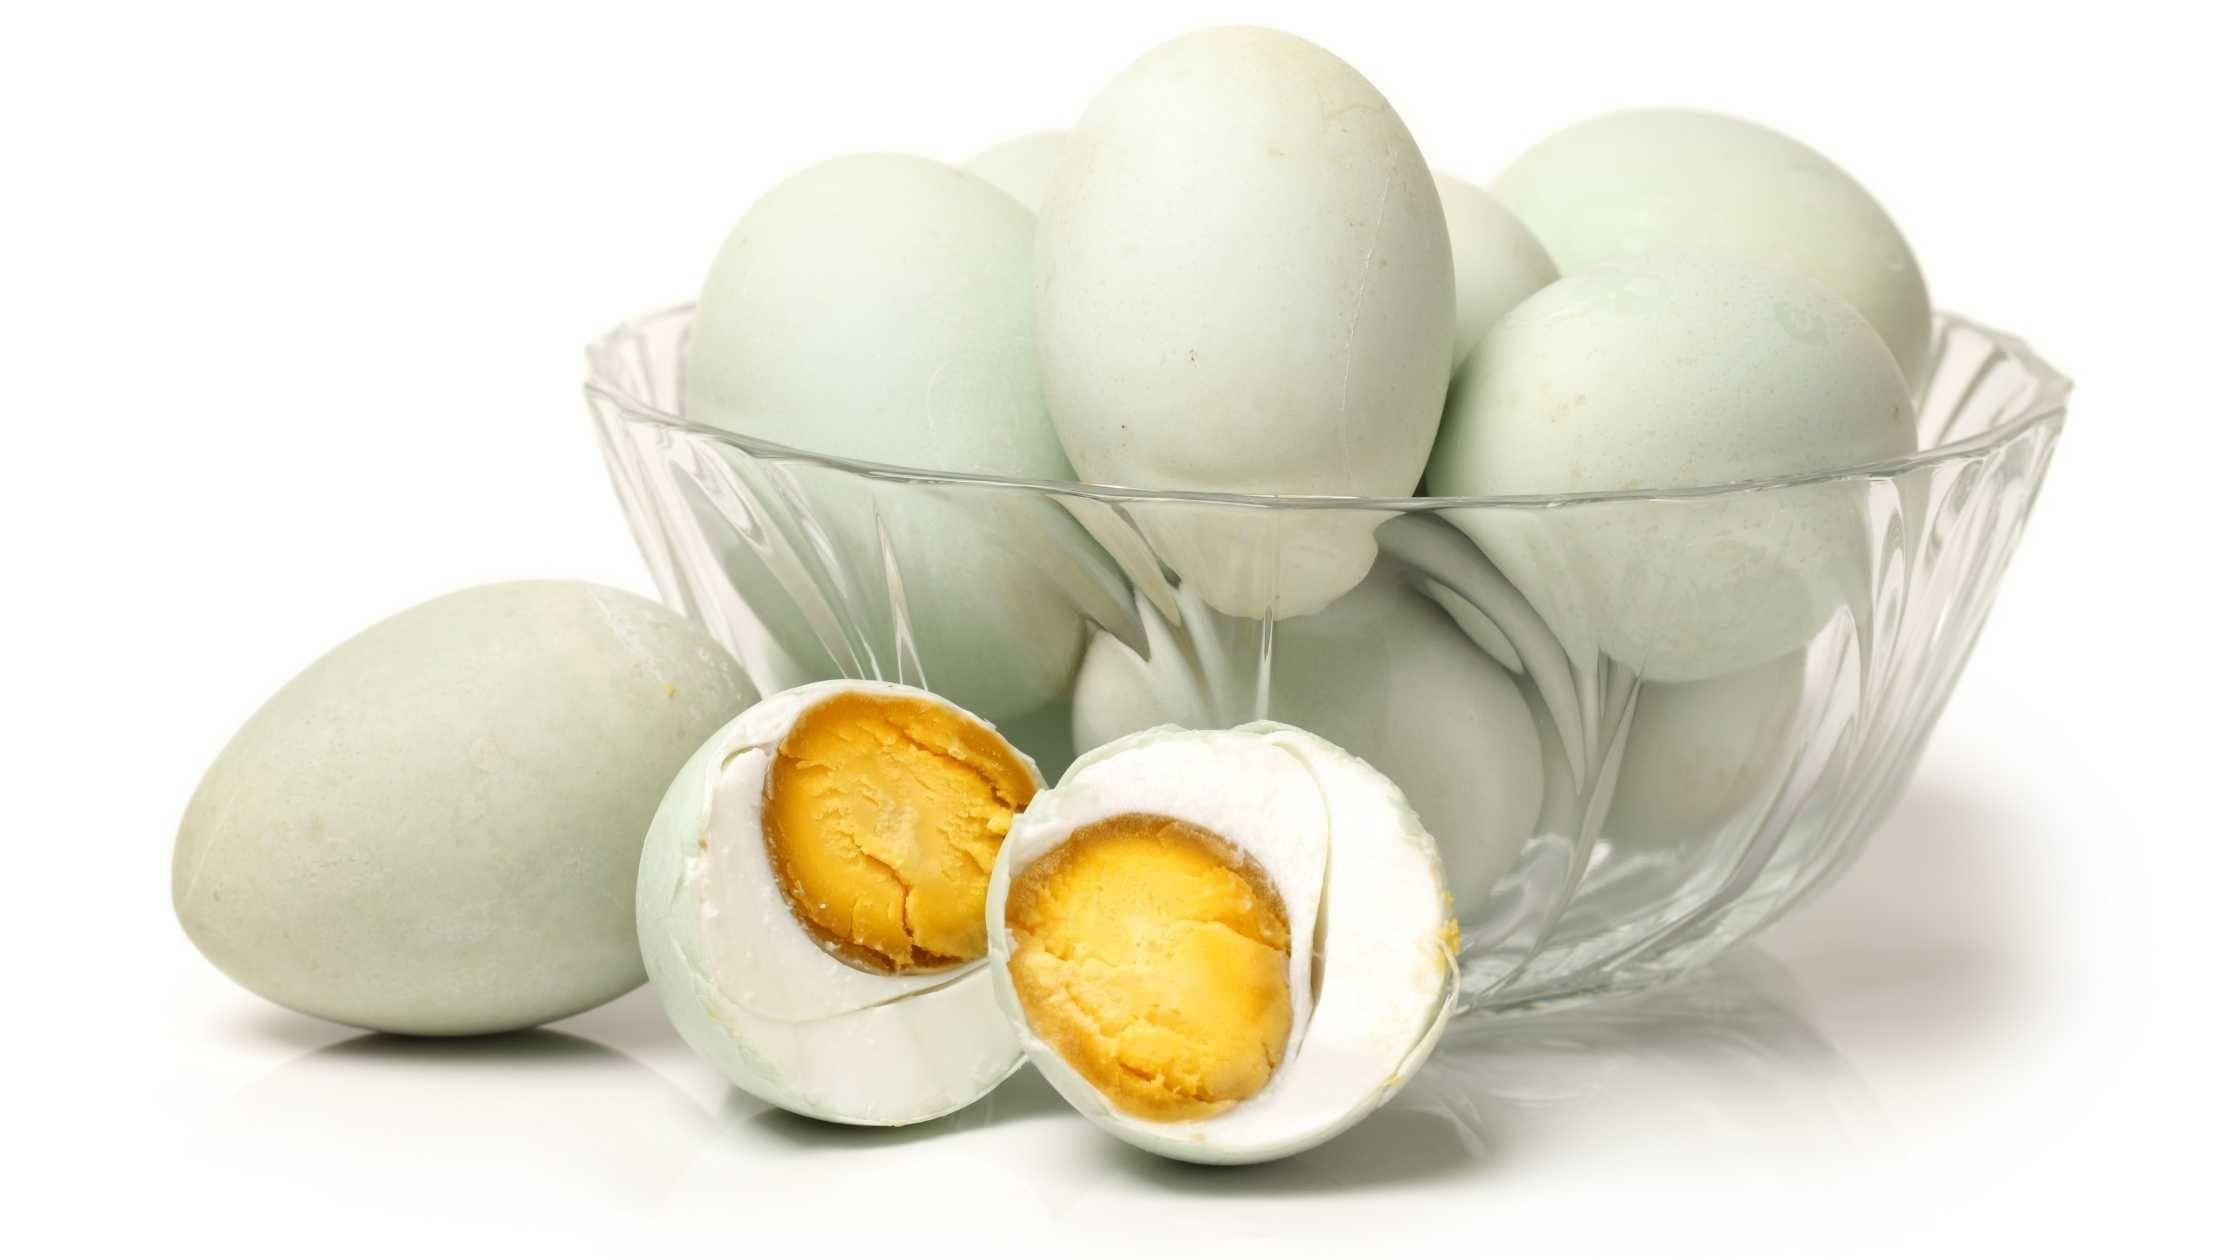 Telur asin untuk pepes